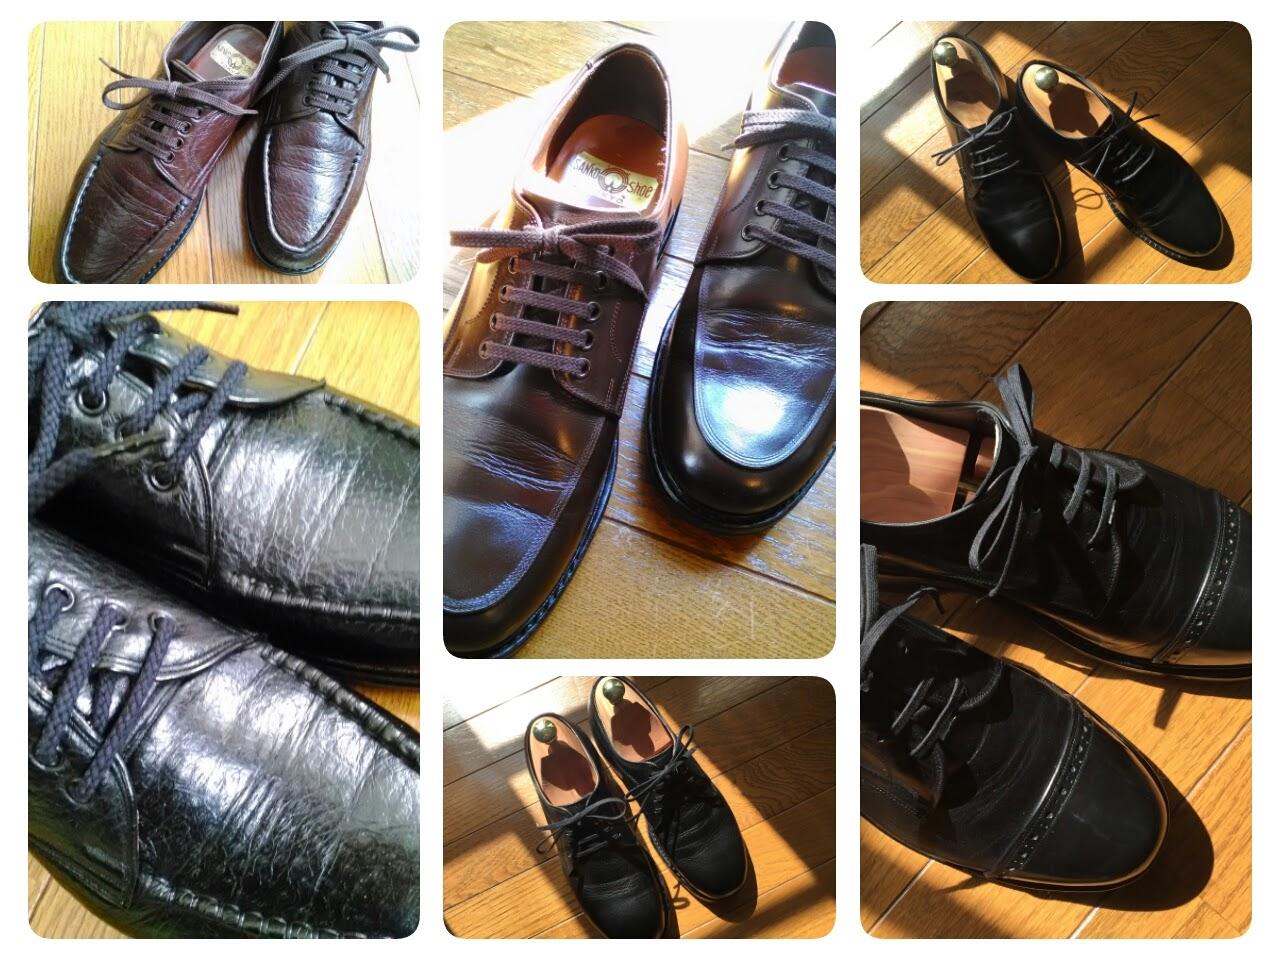 1045-201510_Sanko Shoe Rugged Shoes